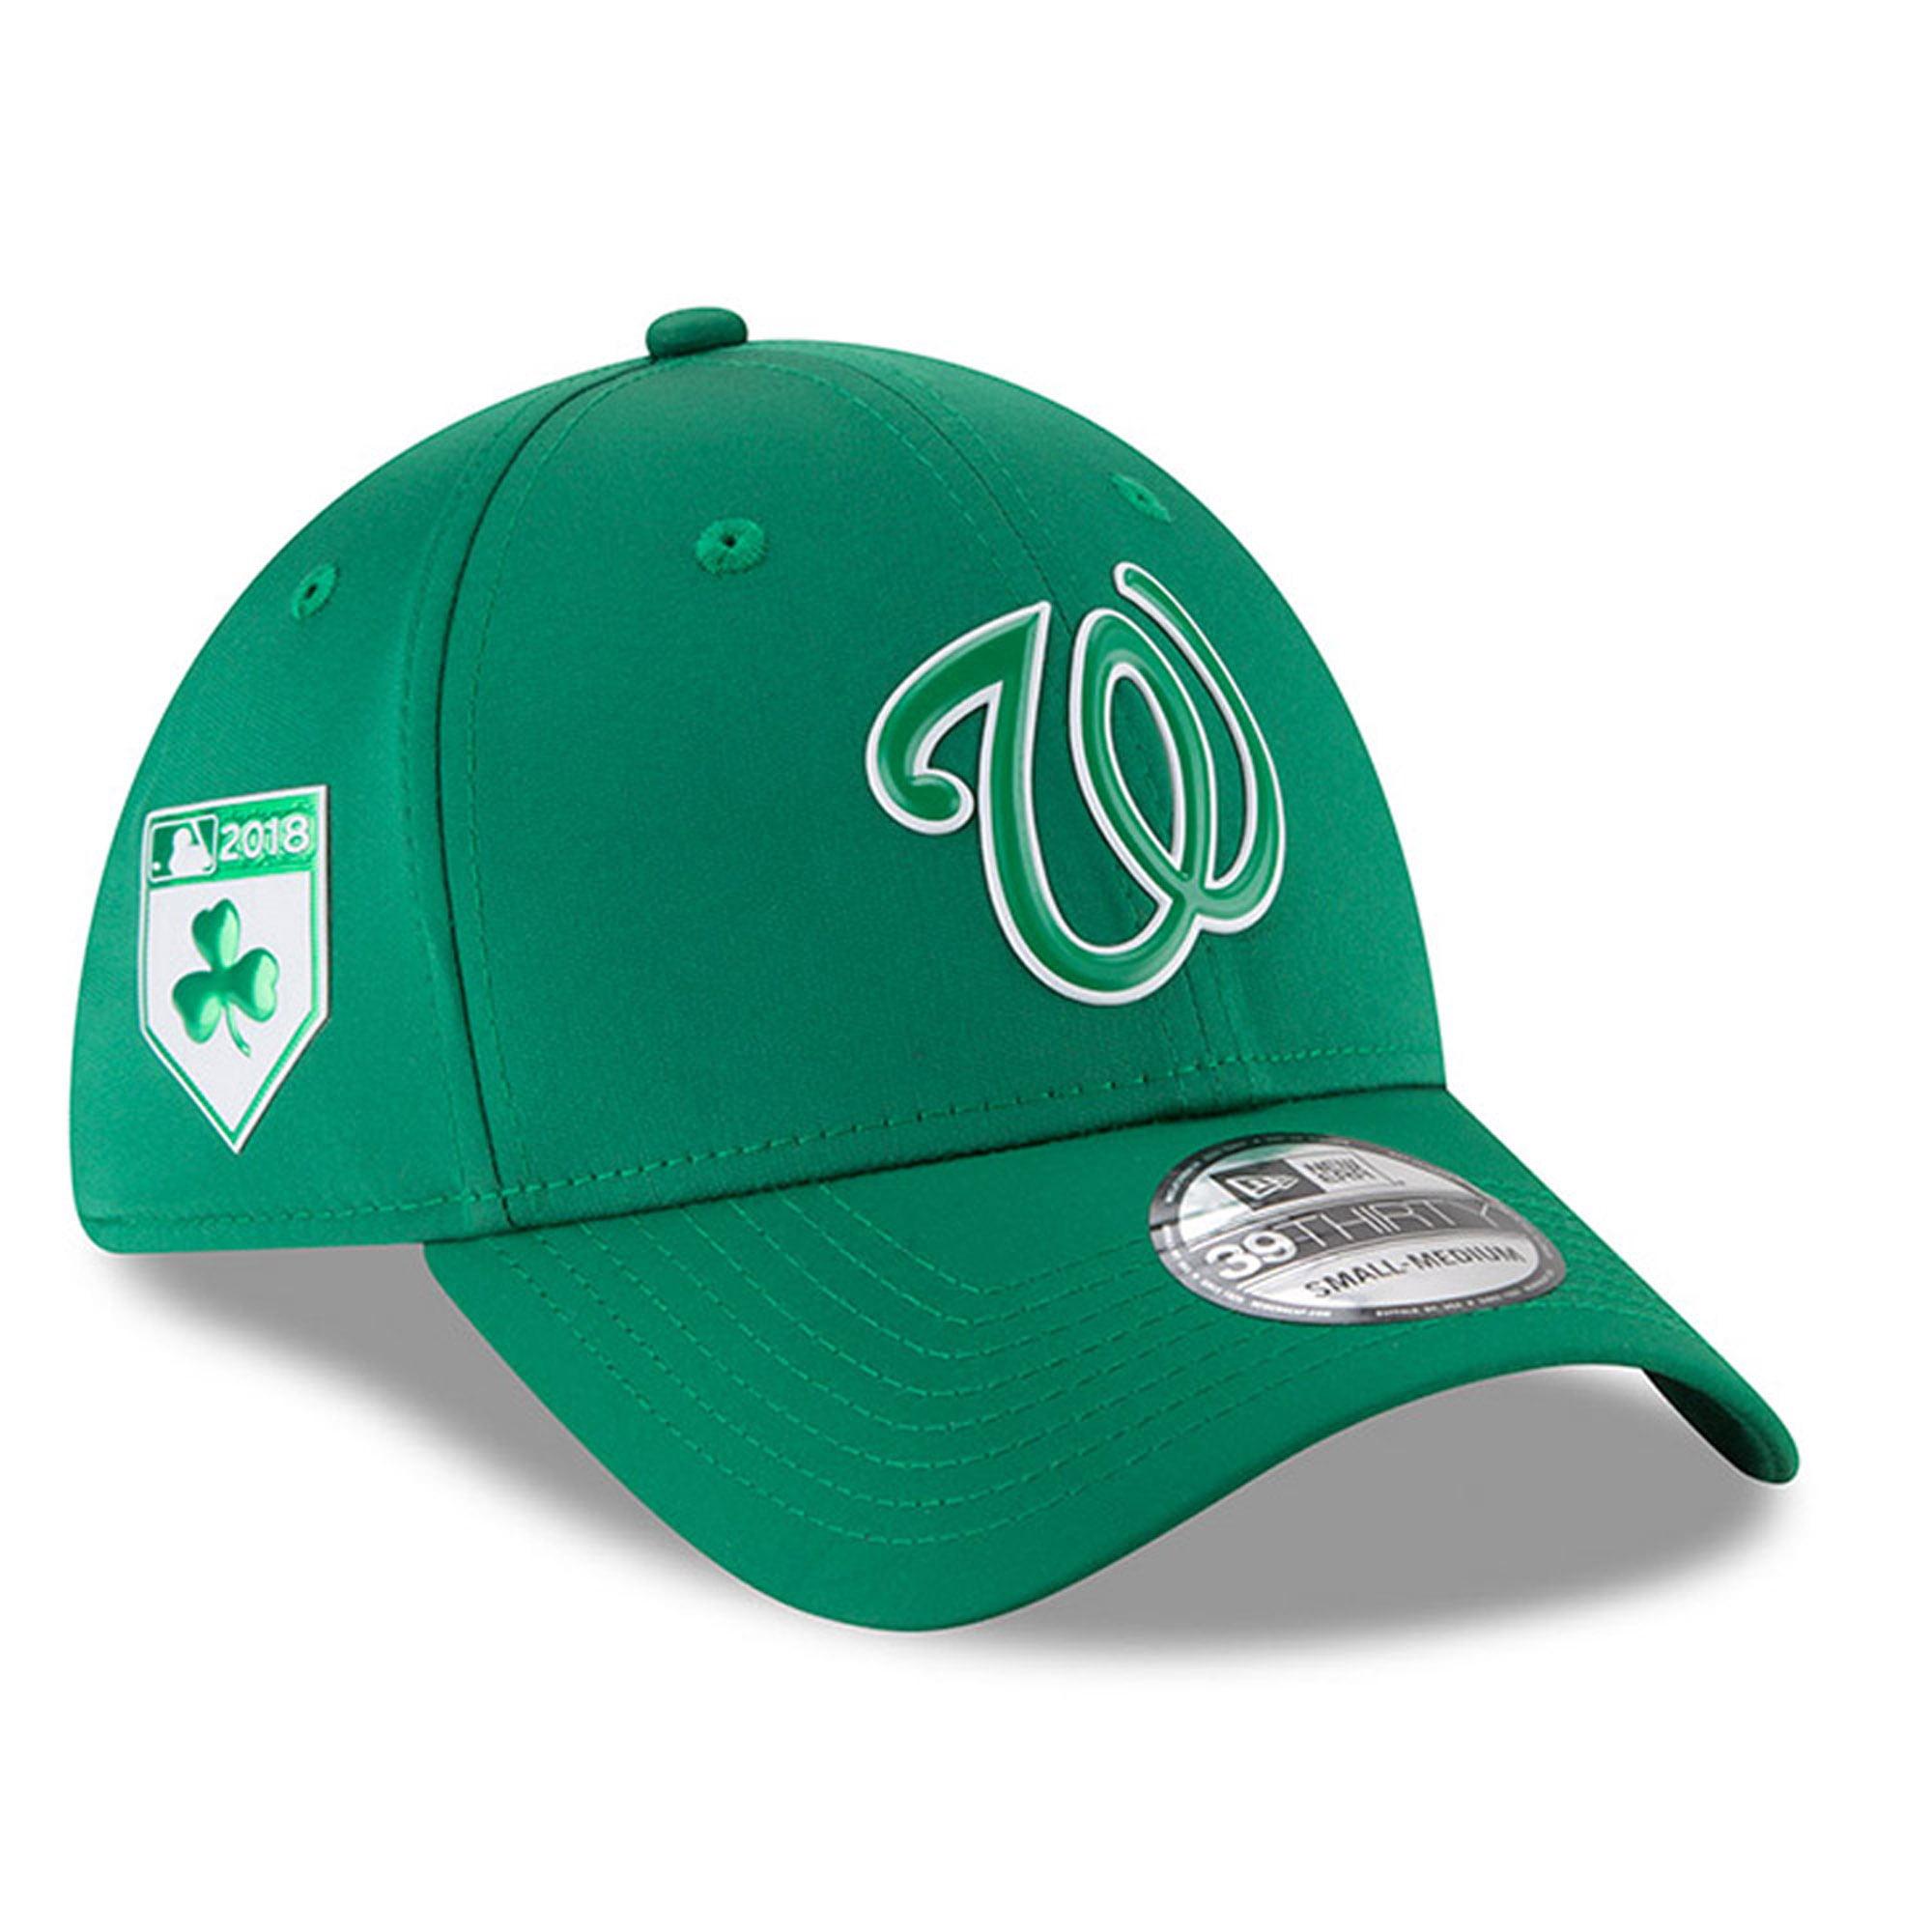 Washington Nationals New Era 2018 St. Patrick's Day Prolight 39THIRTY Flex Hat - Green